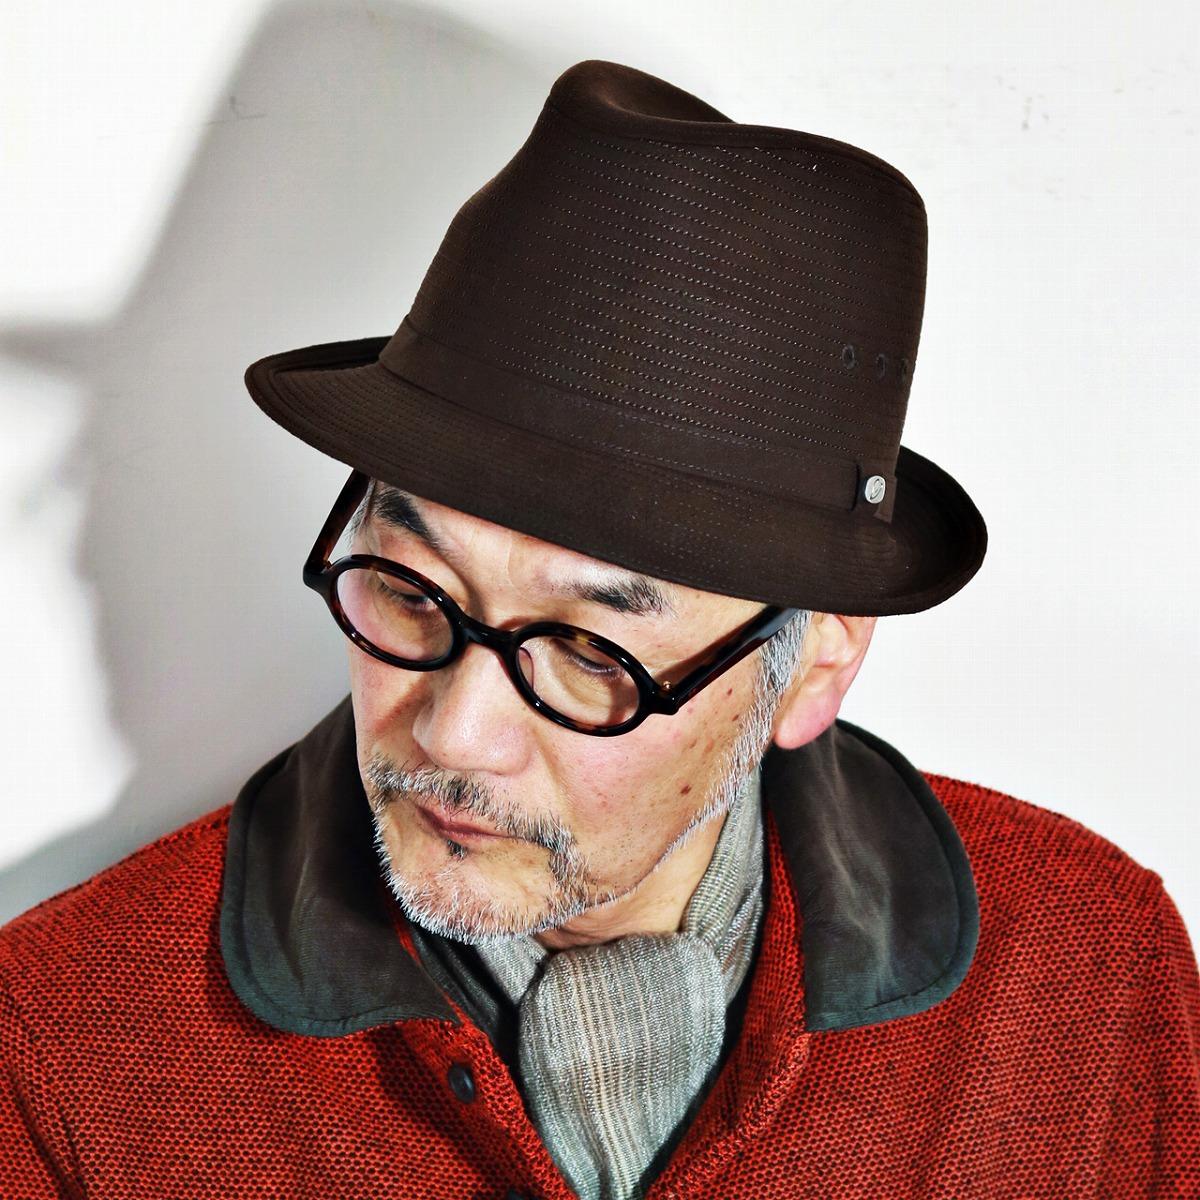 297088d930c Hat Hat suede   turu Hat borsalino borsalino   fall winter new   Brown  (Japan turu Hat winter store tear drop fall winter men men s hat CAP and  stylish ...